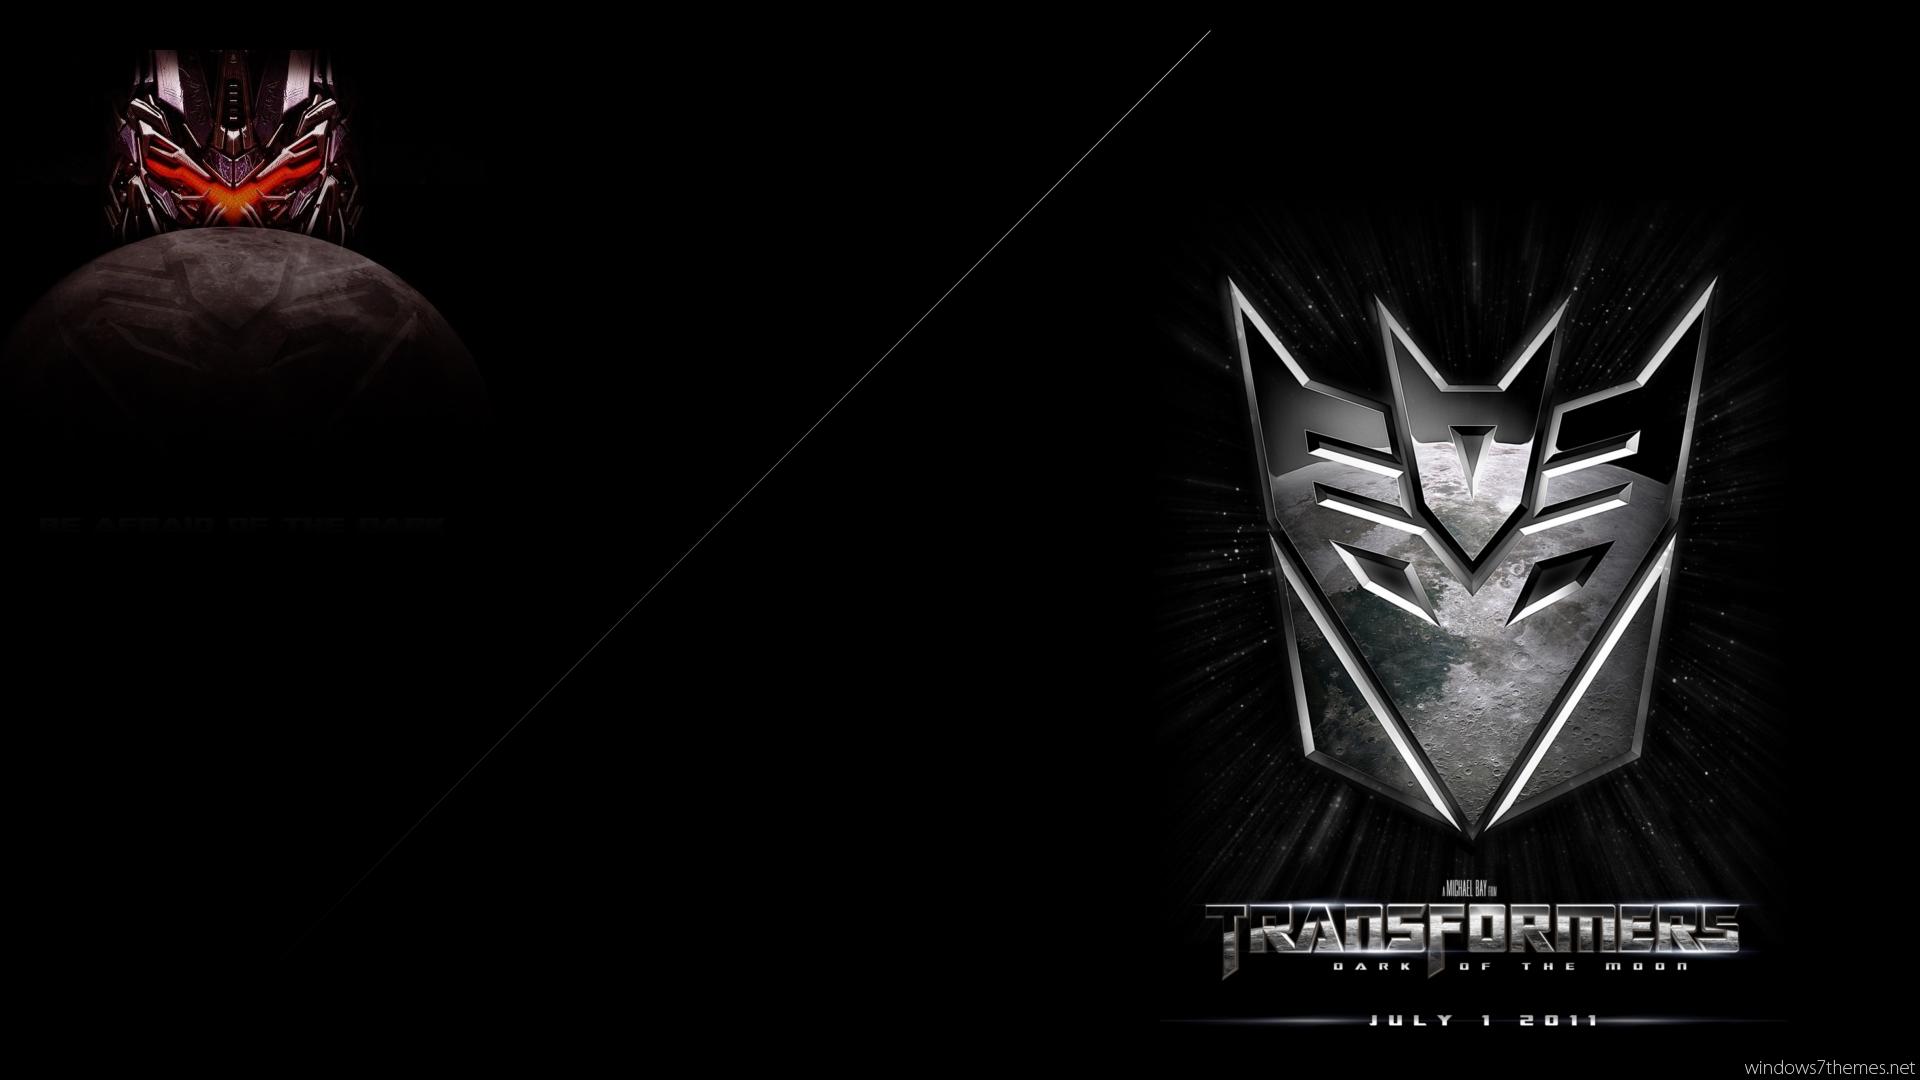 Download Transformers 3 Wallpaper 2 1920x1080